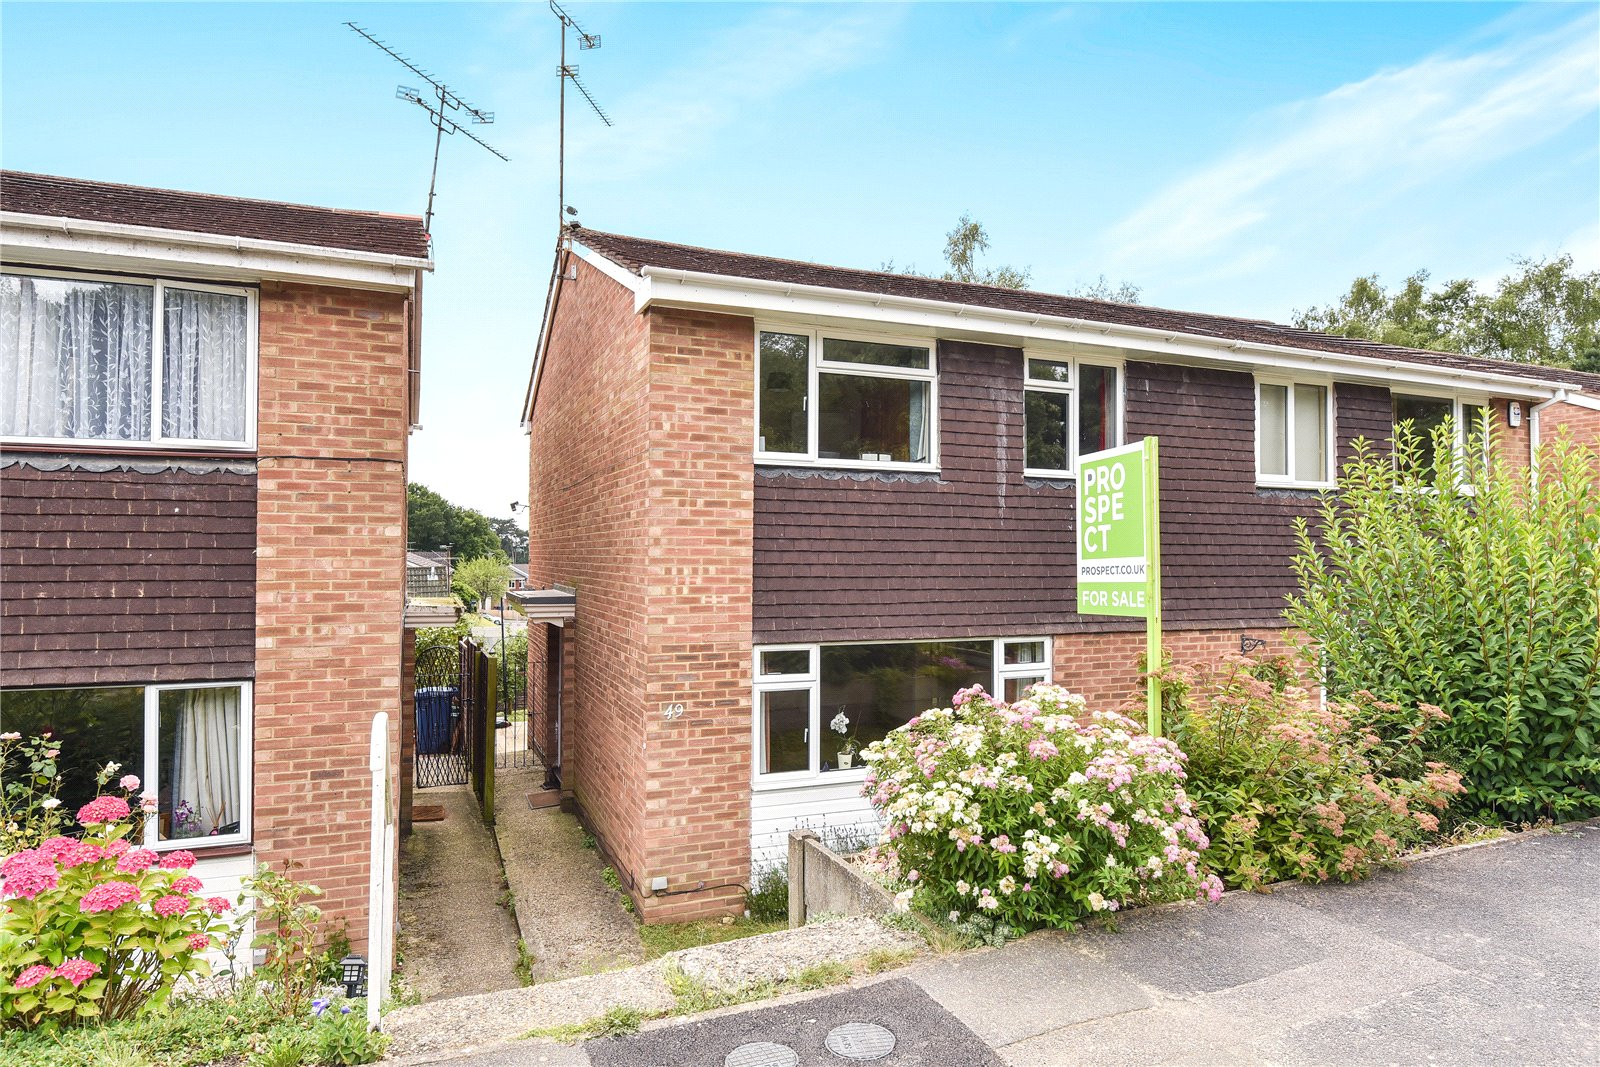 3 Bedrooms Semi Detached House for sale in Grampian Road, Little Sandhurst, Berkshire, GU47